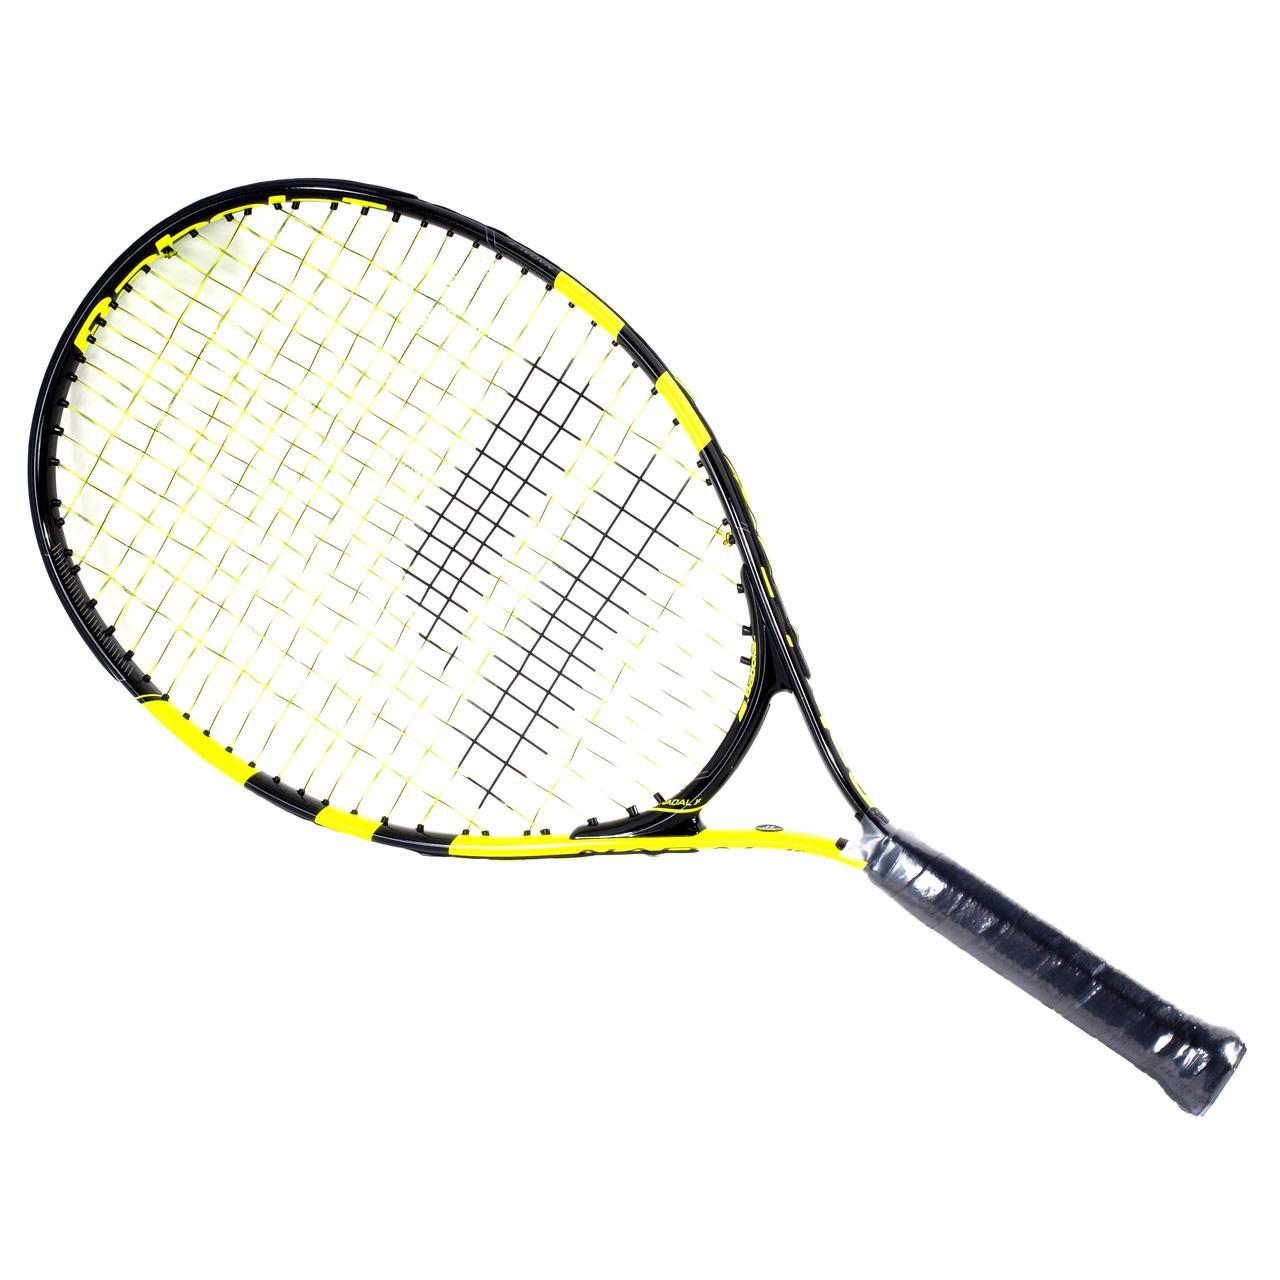 raquette de tennis babolat nadal 23 2016 noir 78302 neuf. Black Bedroom Furniture Sets. Home Design Ideas